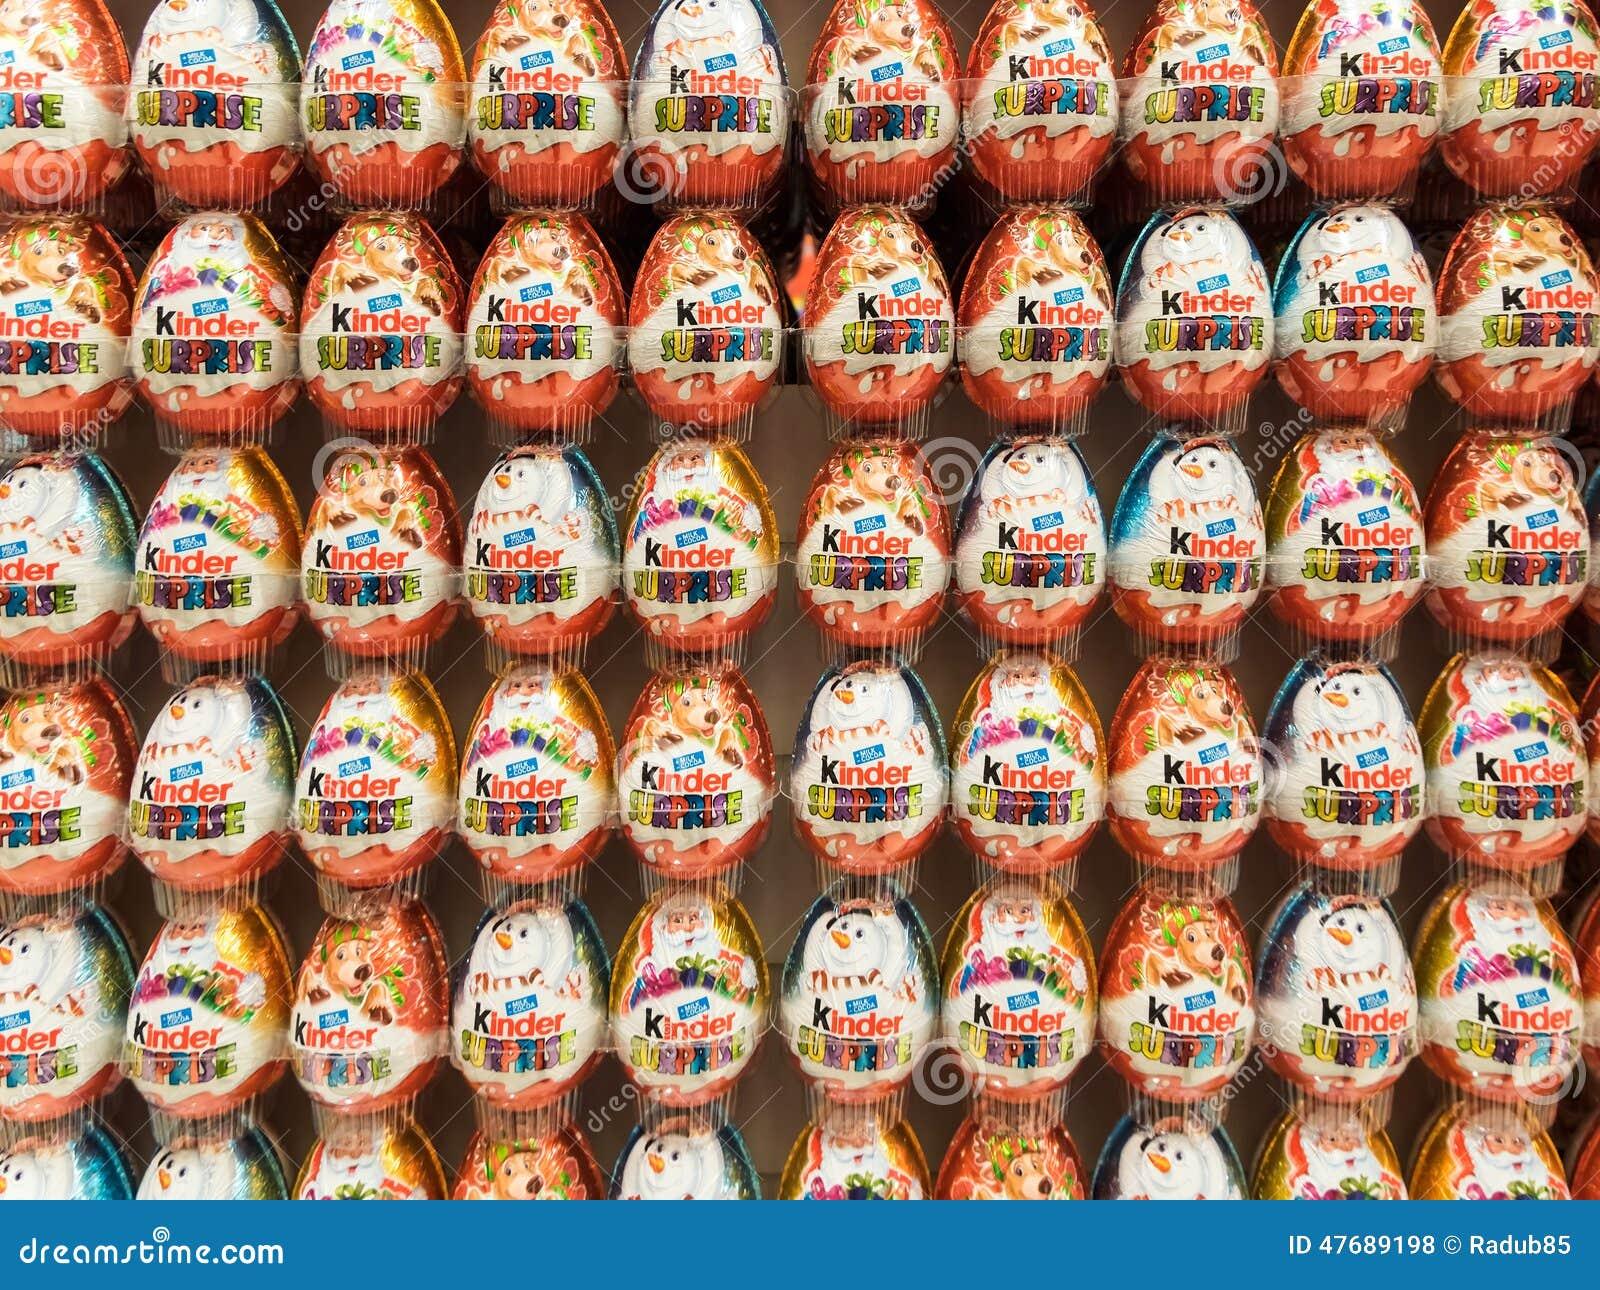 Kinder Surprise Chocolate Eggs Editorial Stock Photo - Image: 47689198